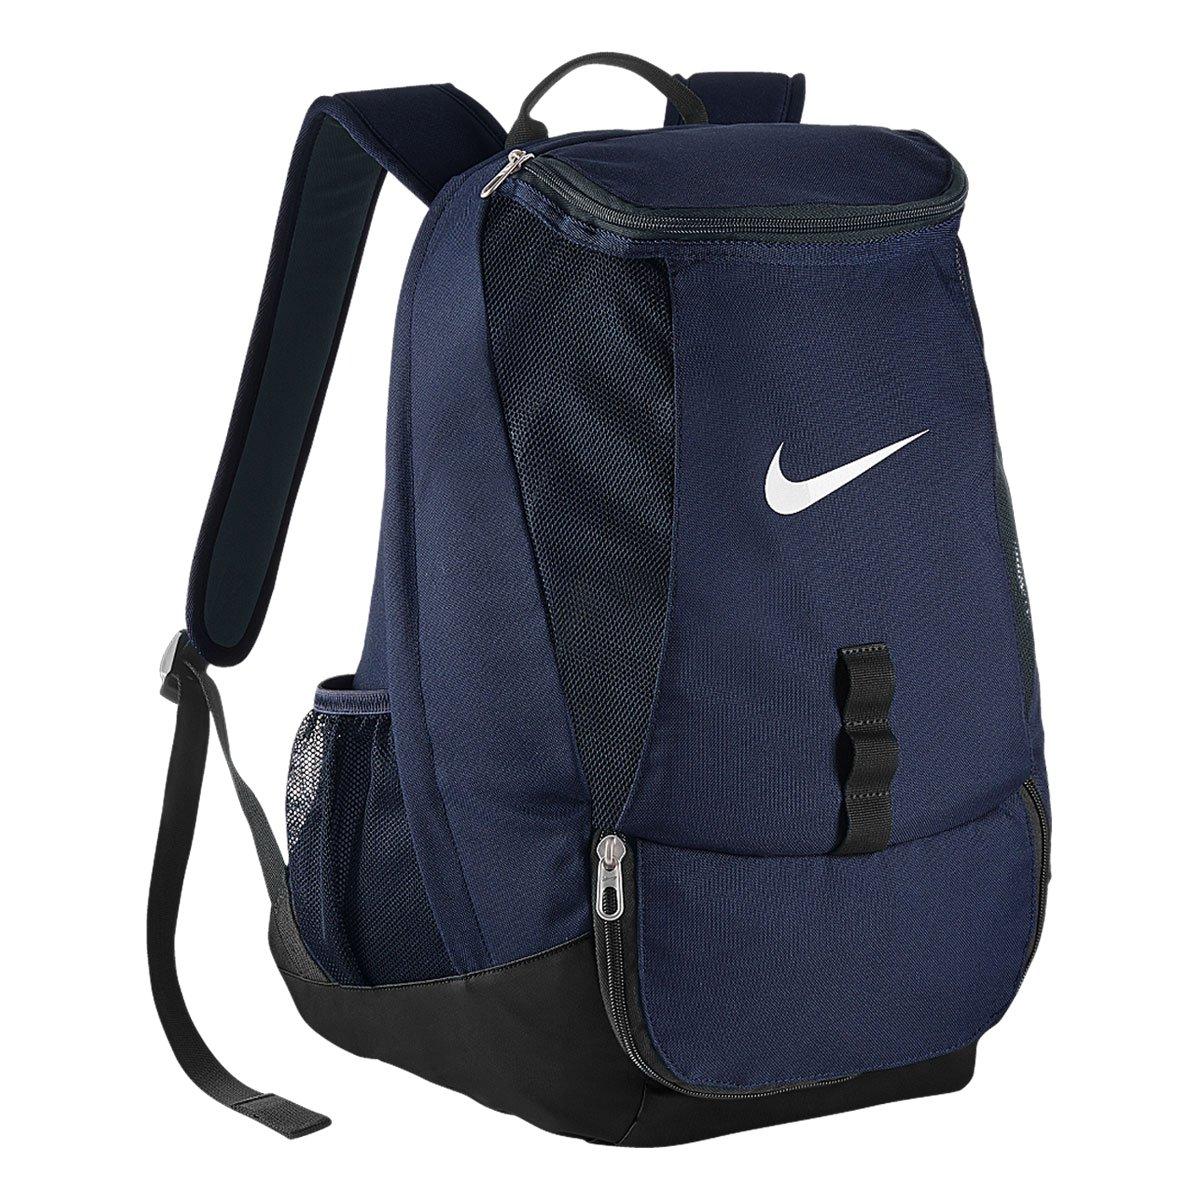 Mochila Nike Club Team Swoosh - Compre Agora  649b7d4946889